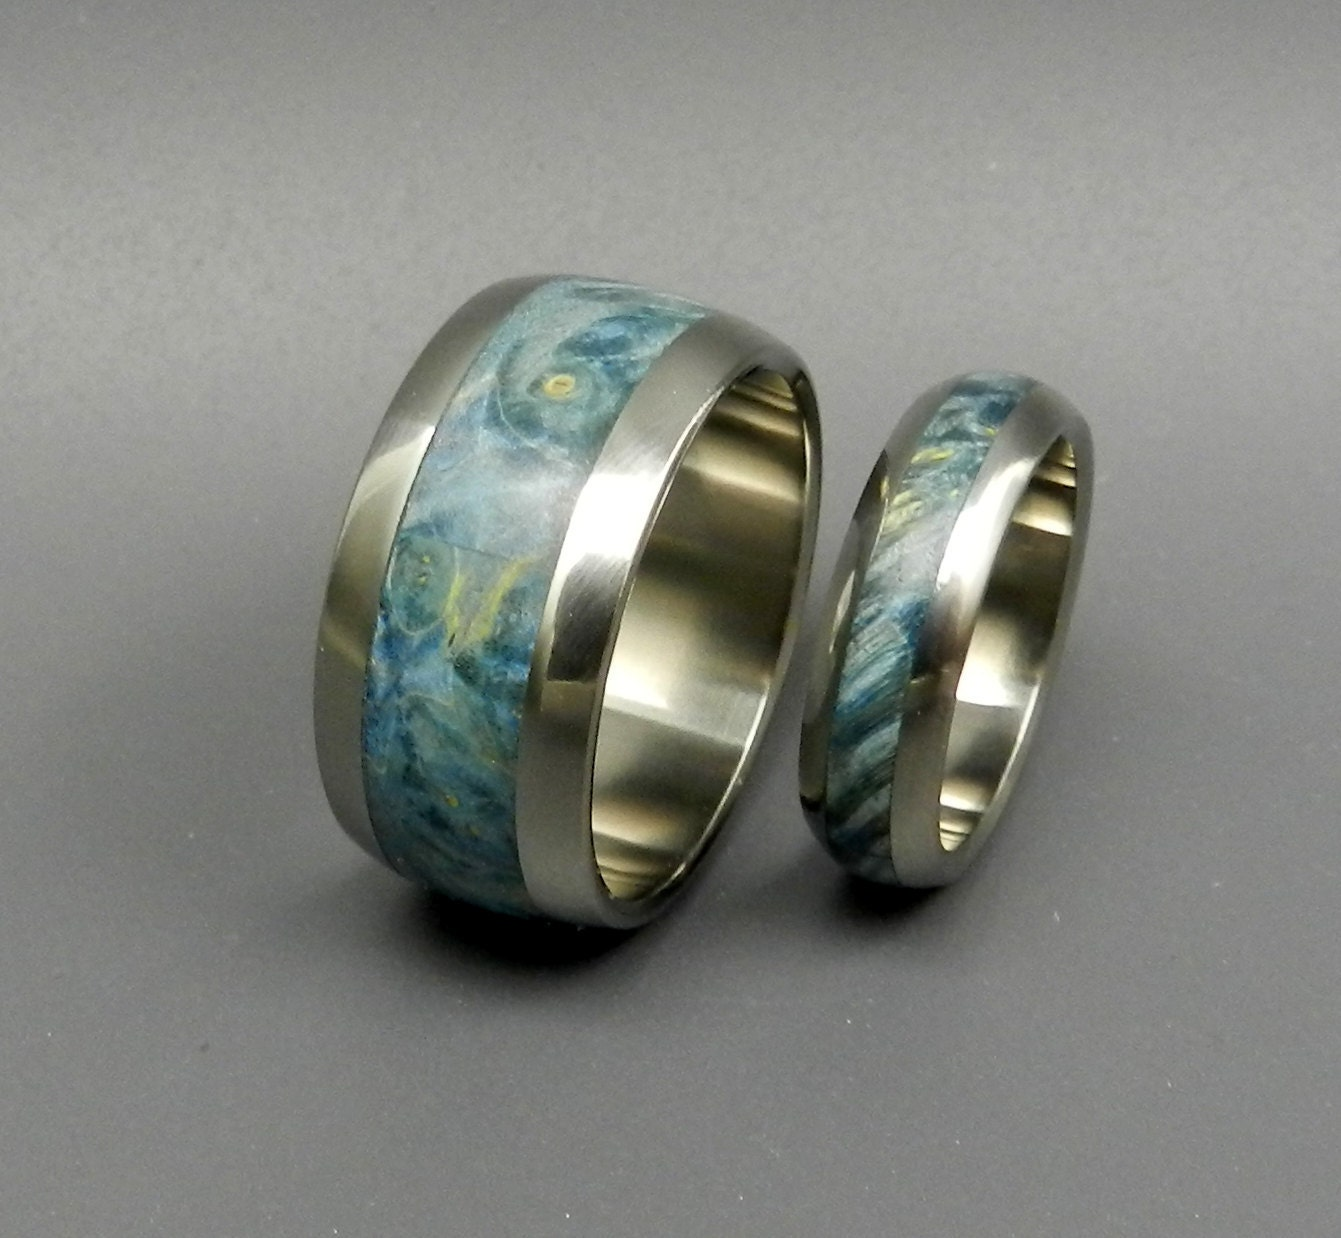 silver wedding rings women wooden wedding rings silver wedding rings women